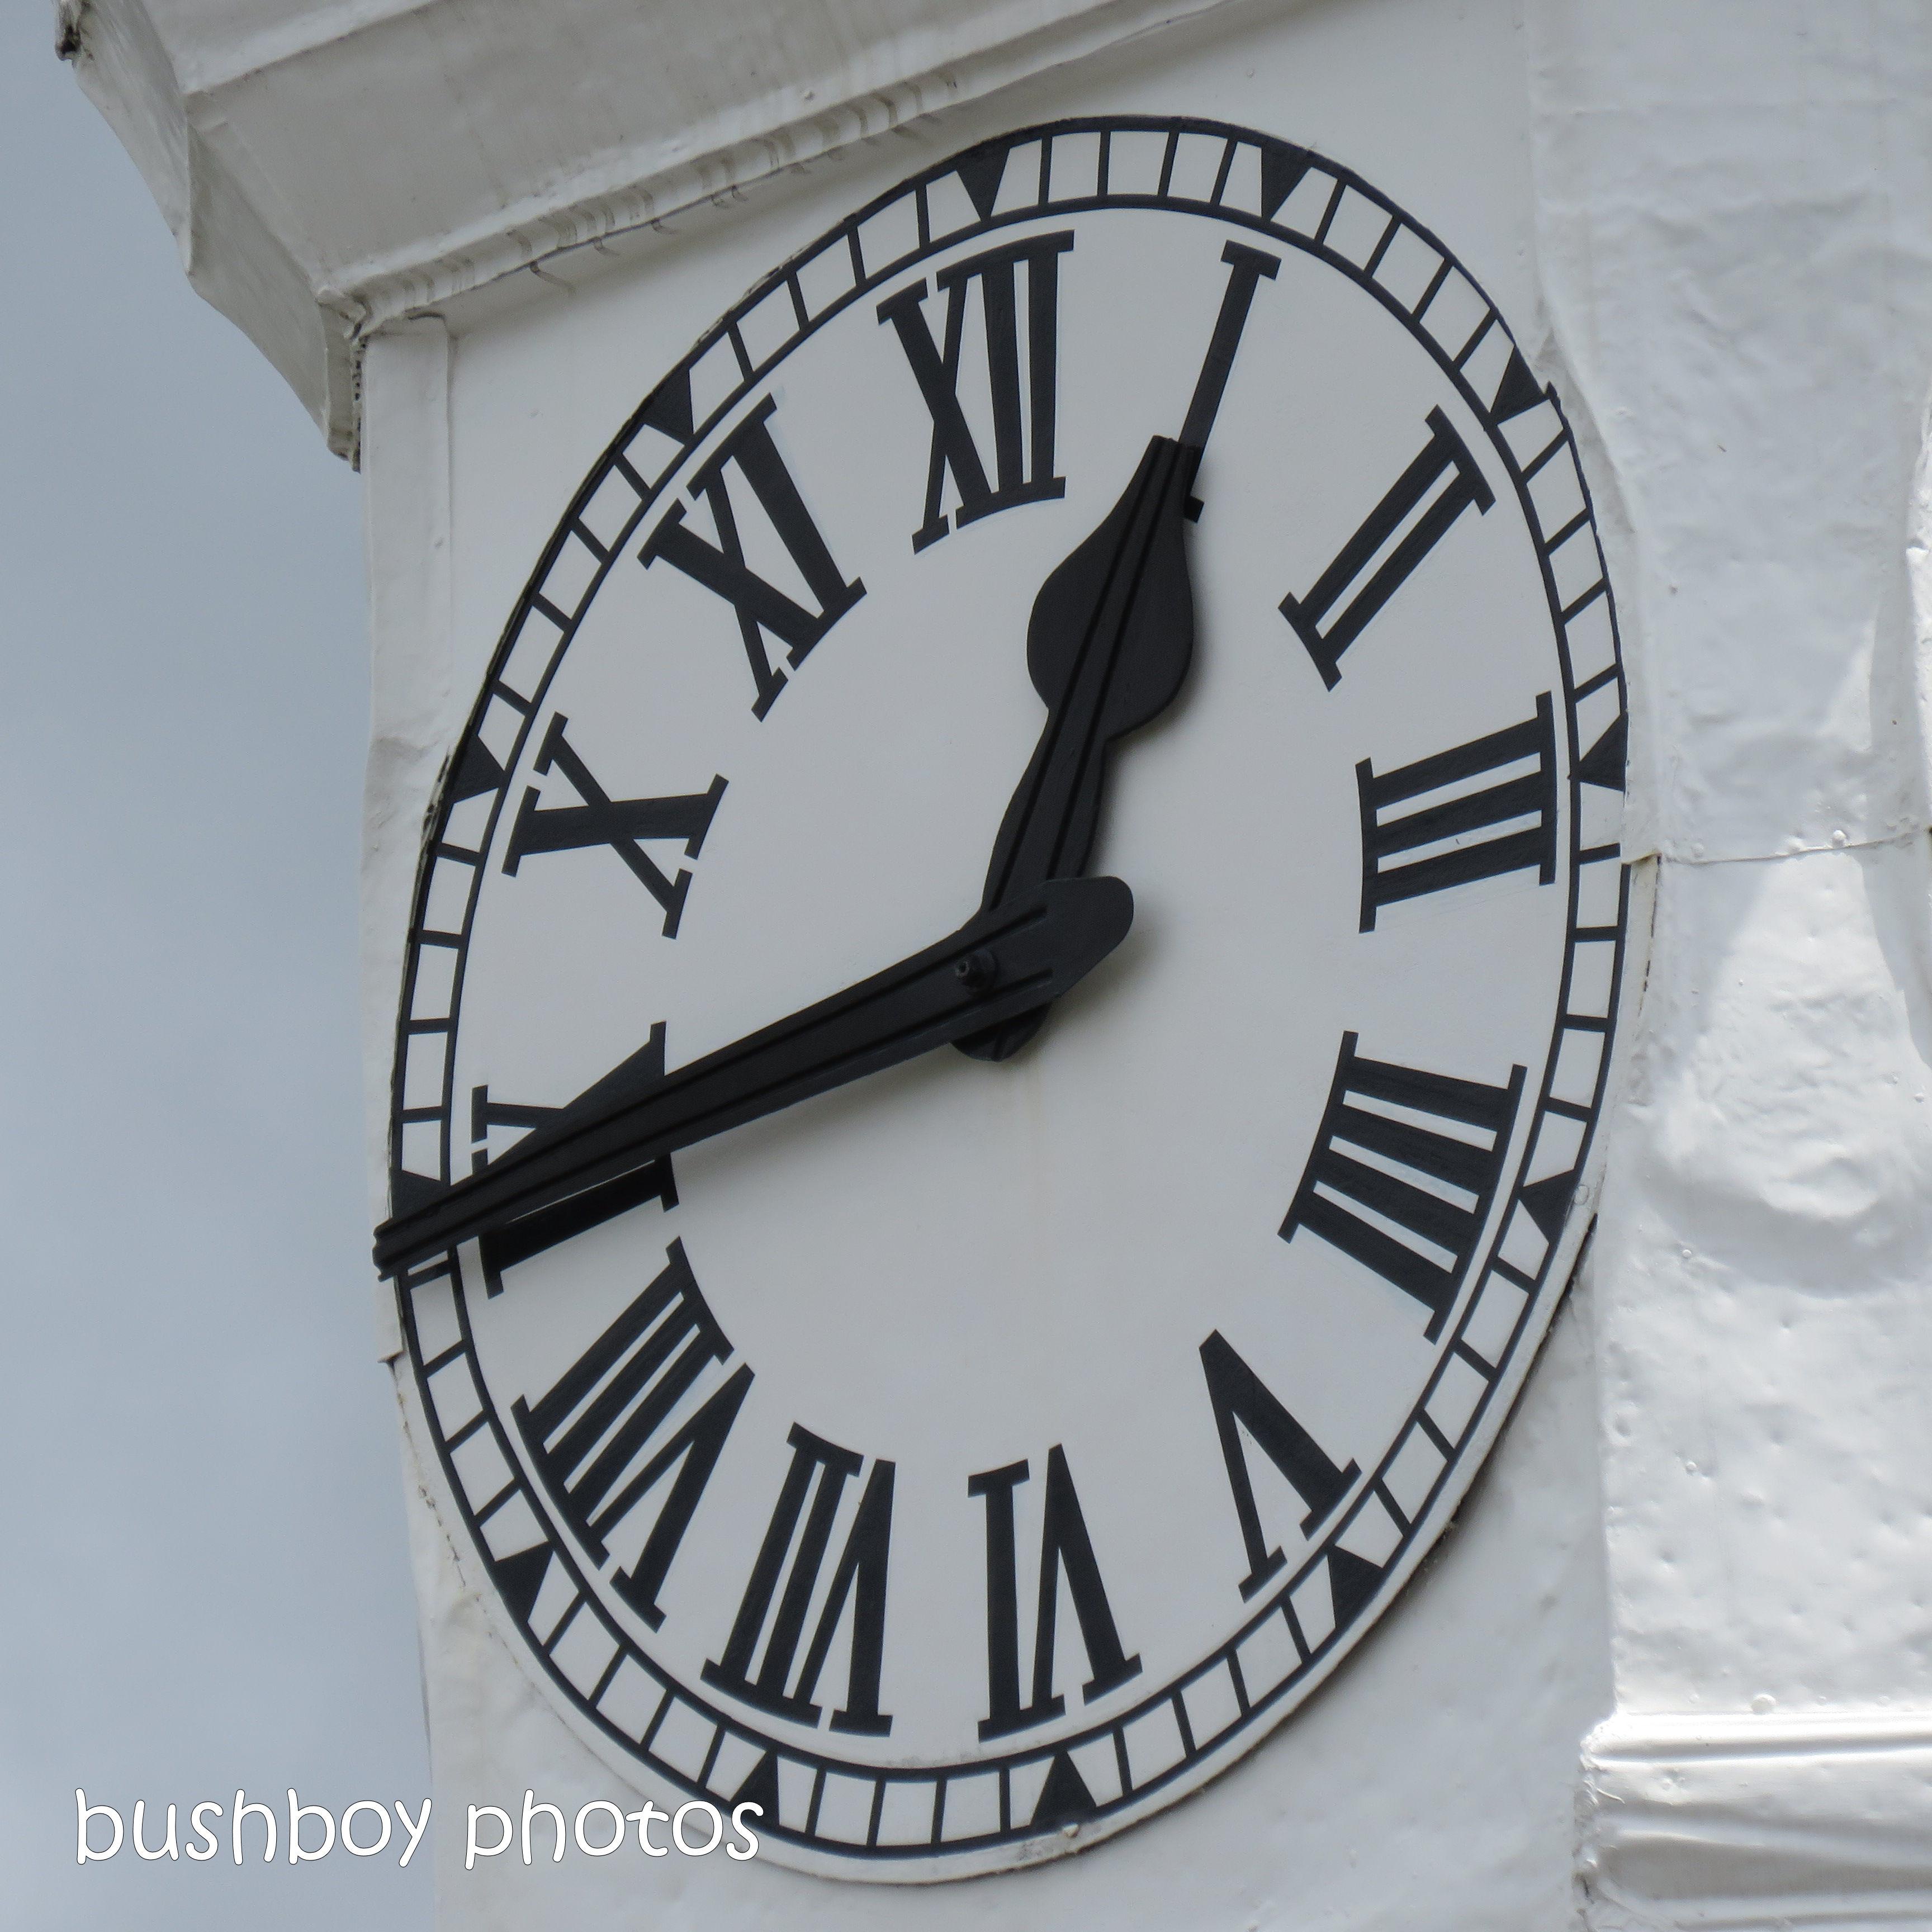 181227_time_square_clock_time